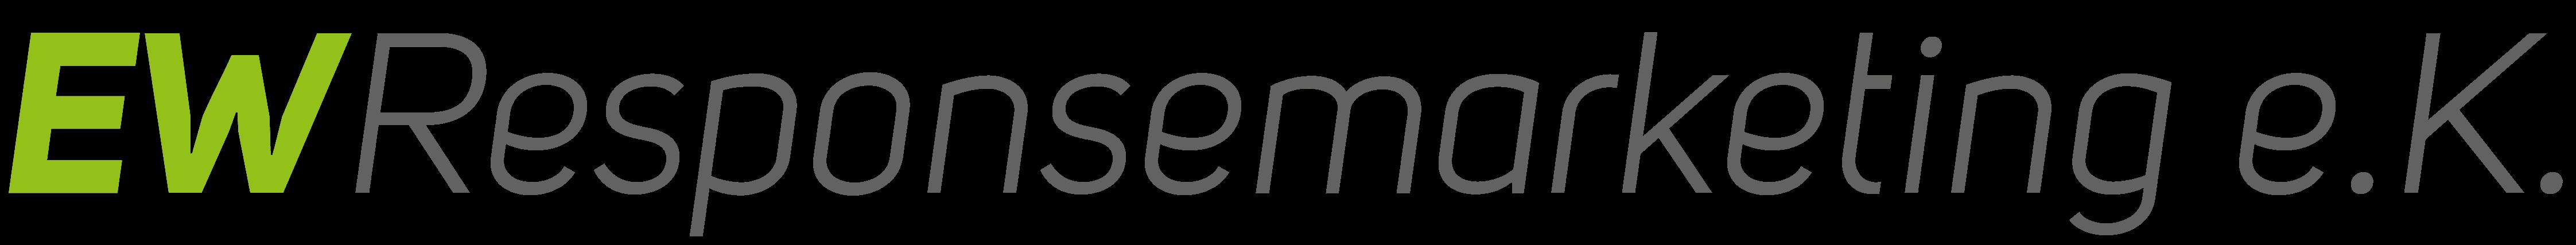 EW Responsemarketing e.K.